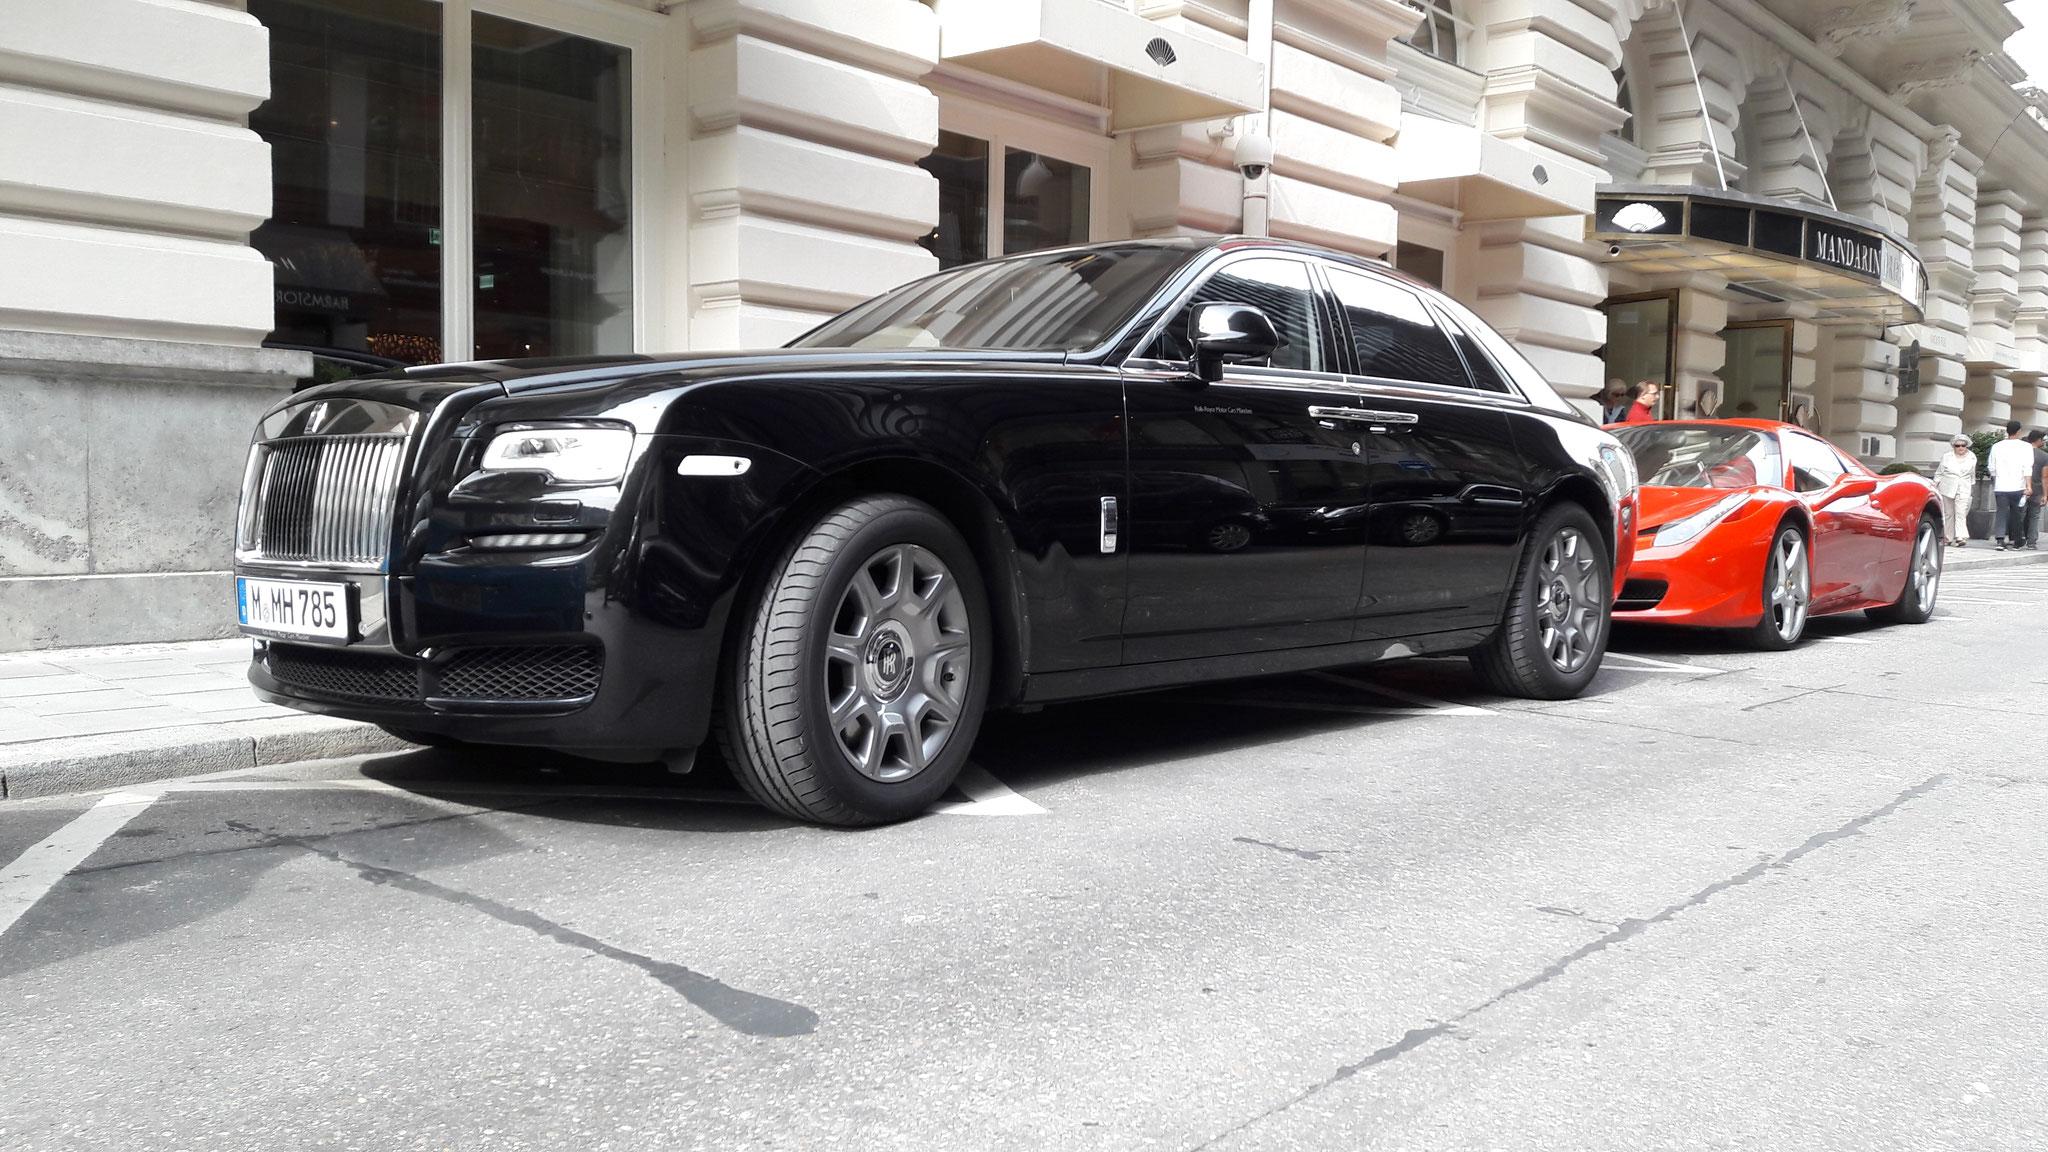 Rolls Royce Ghost Series II - M-MH-785